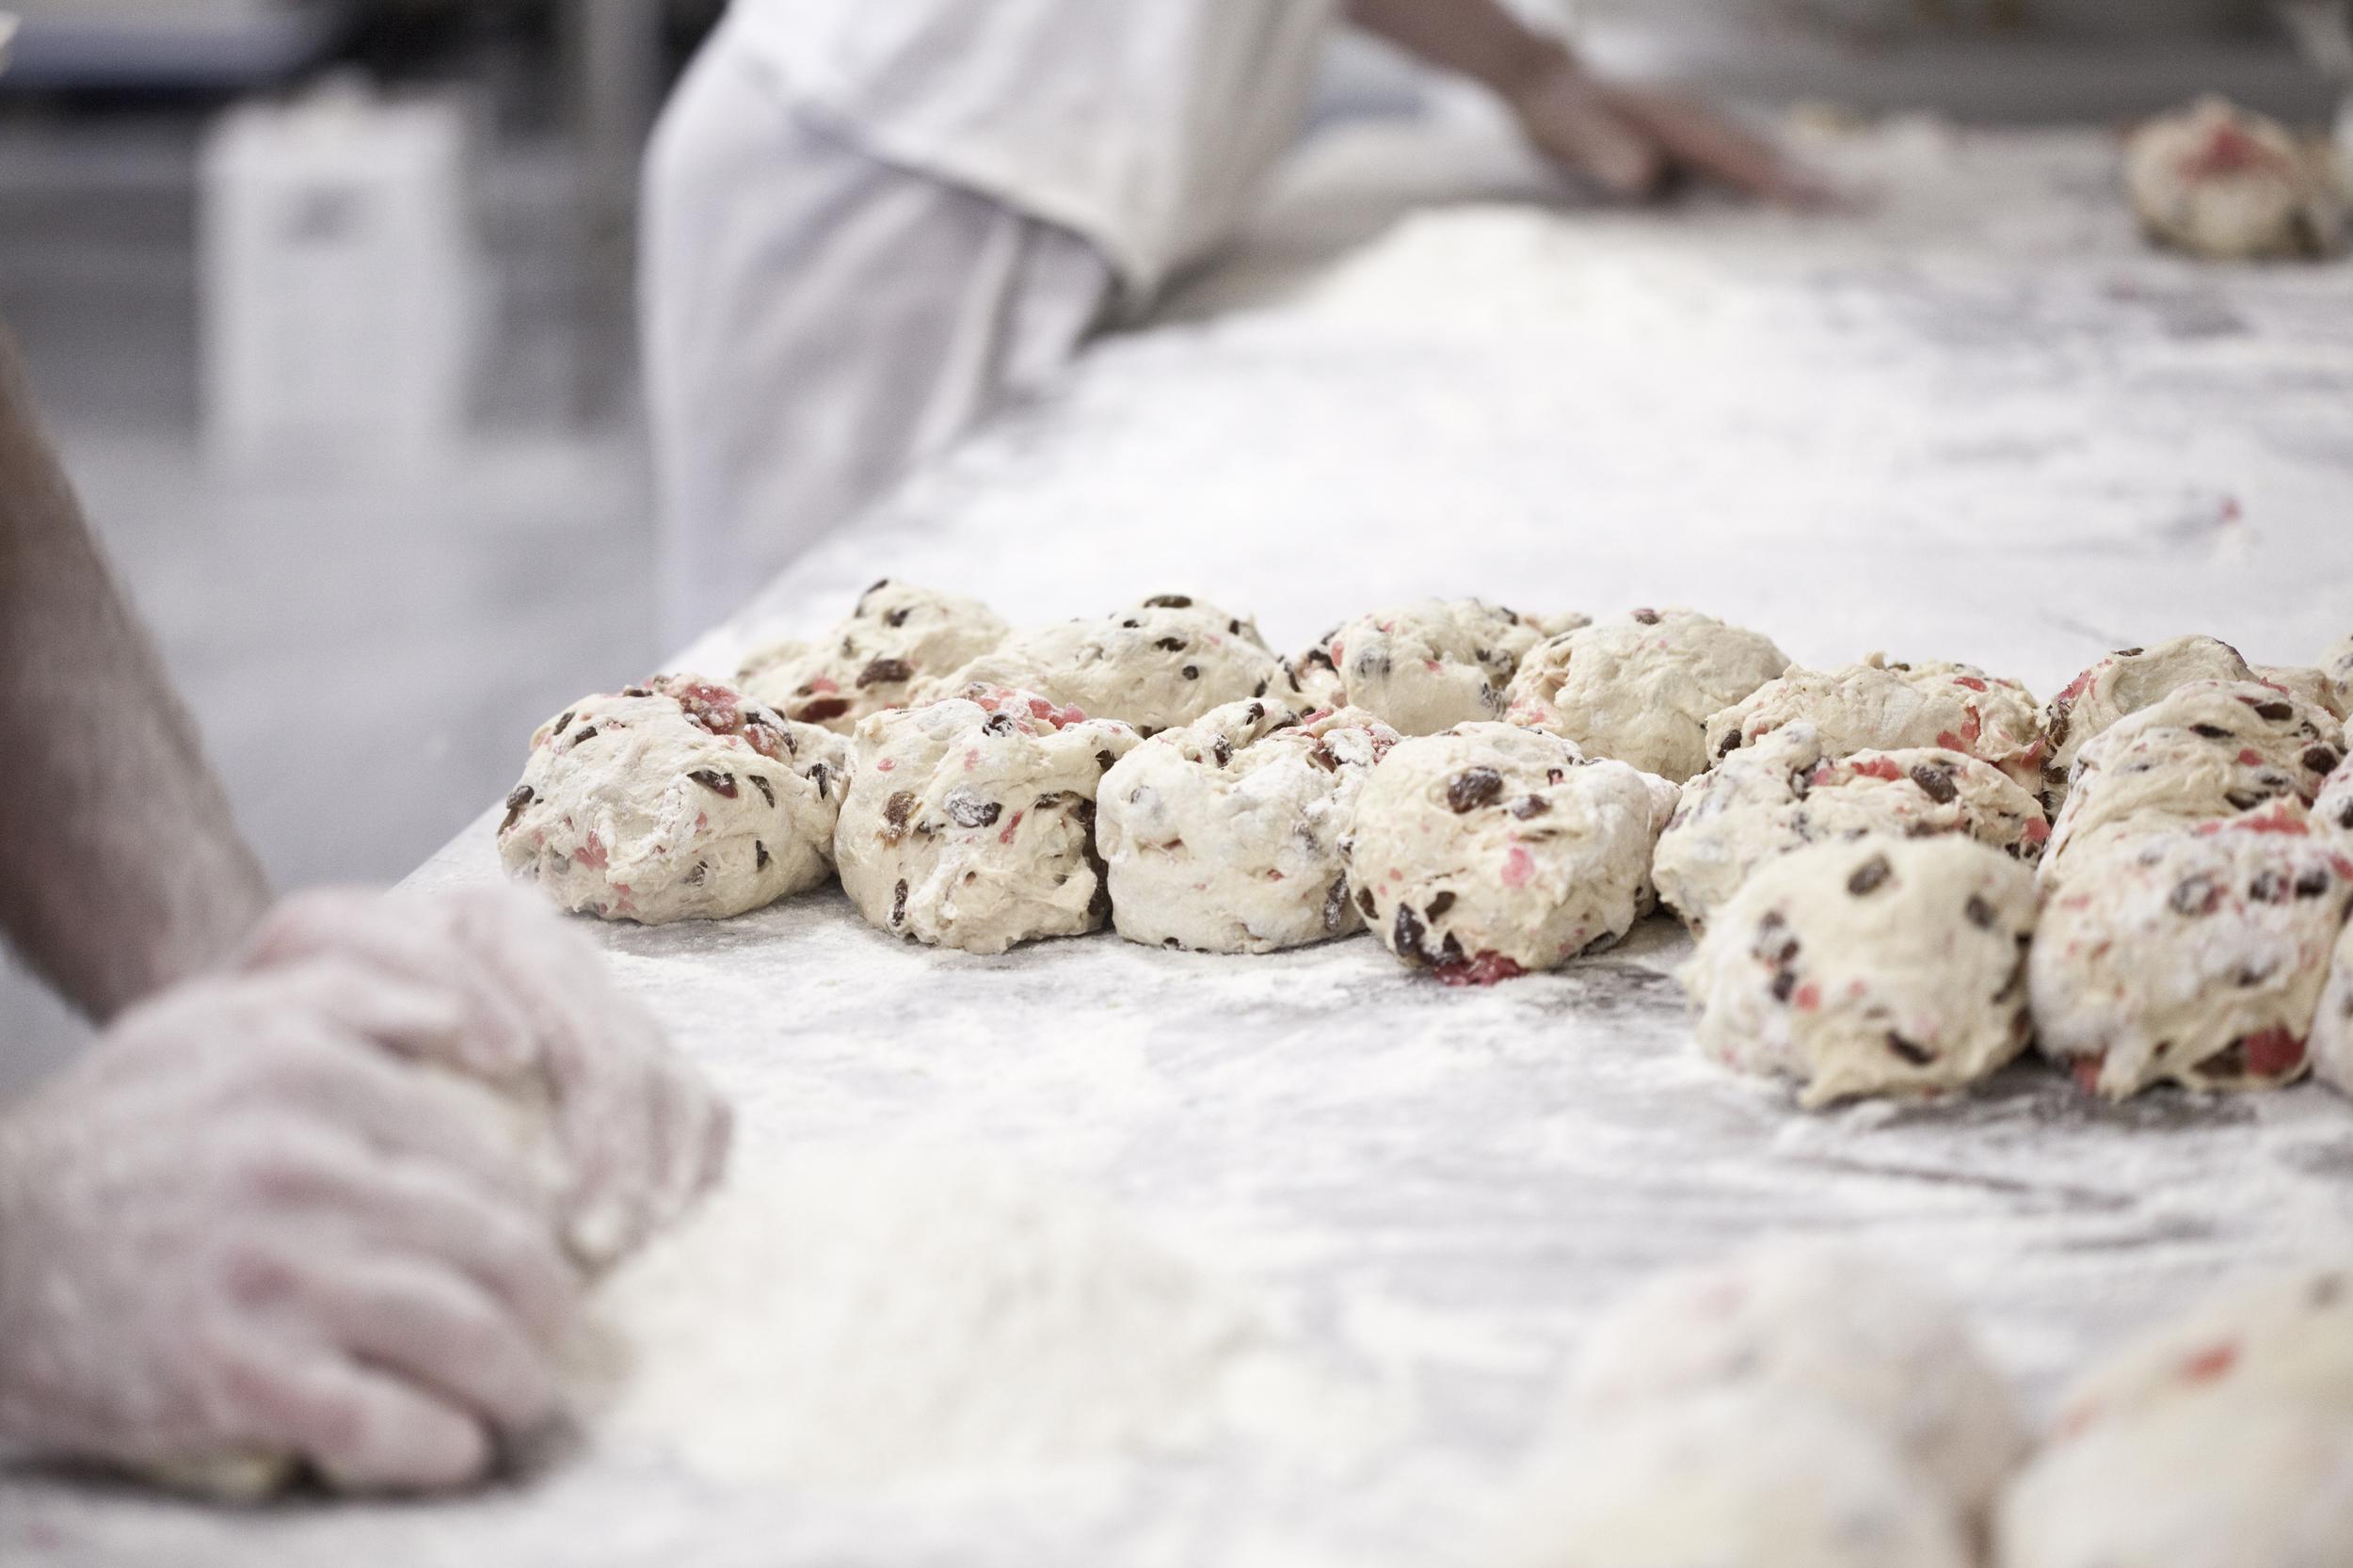 Ashers-Bakery-Site-28web.jpg